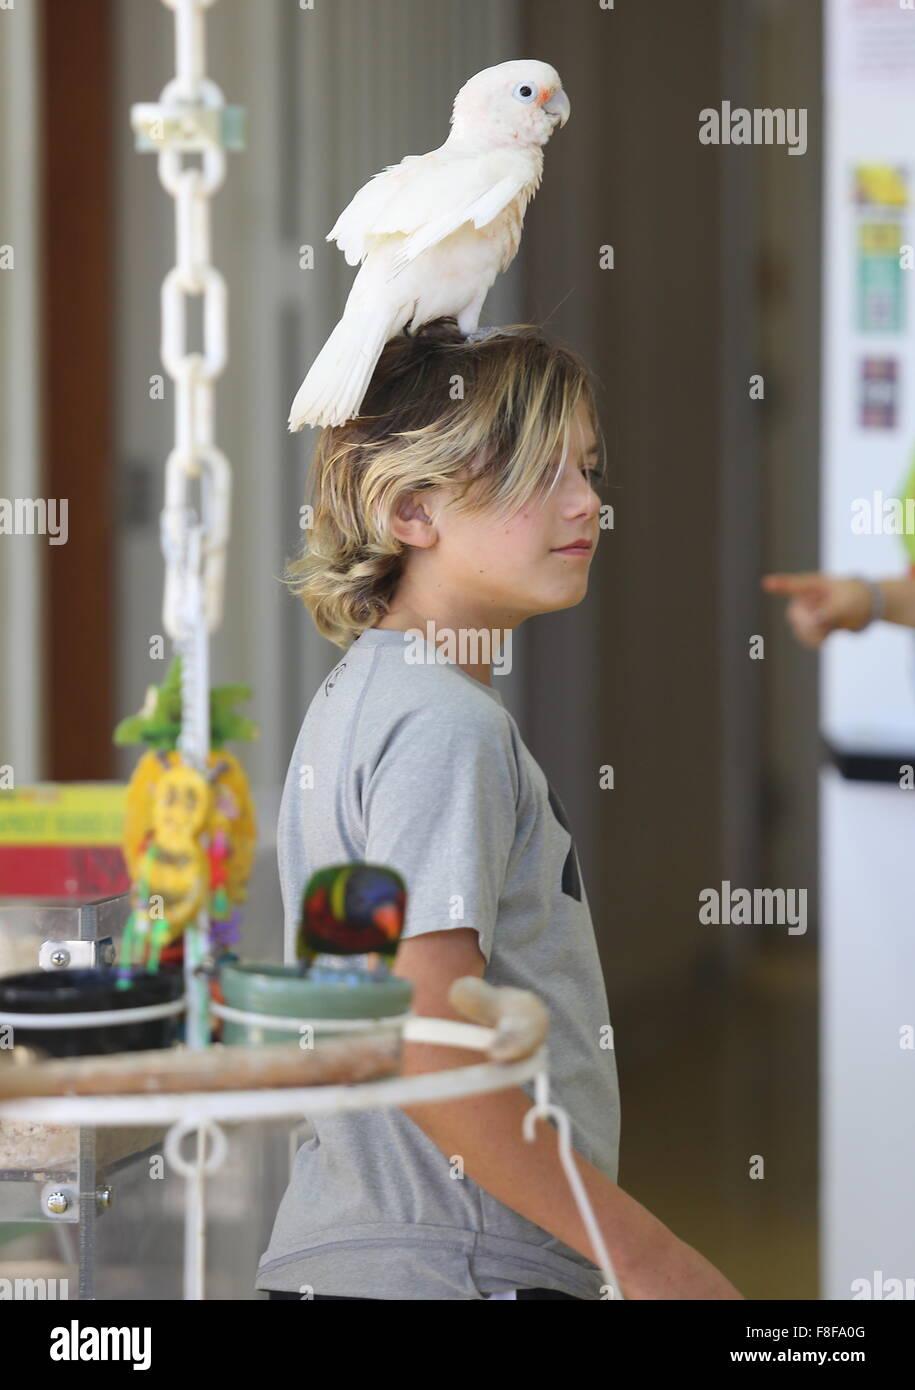 Gwen Stefani visits Omar's Exotic Birds in Santa Monica with